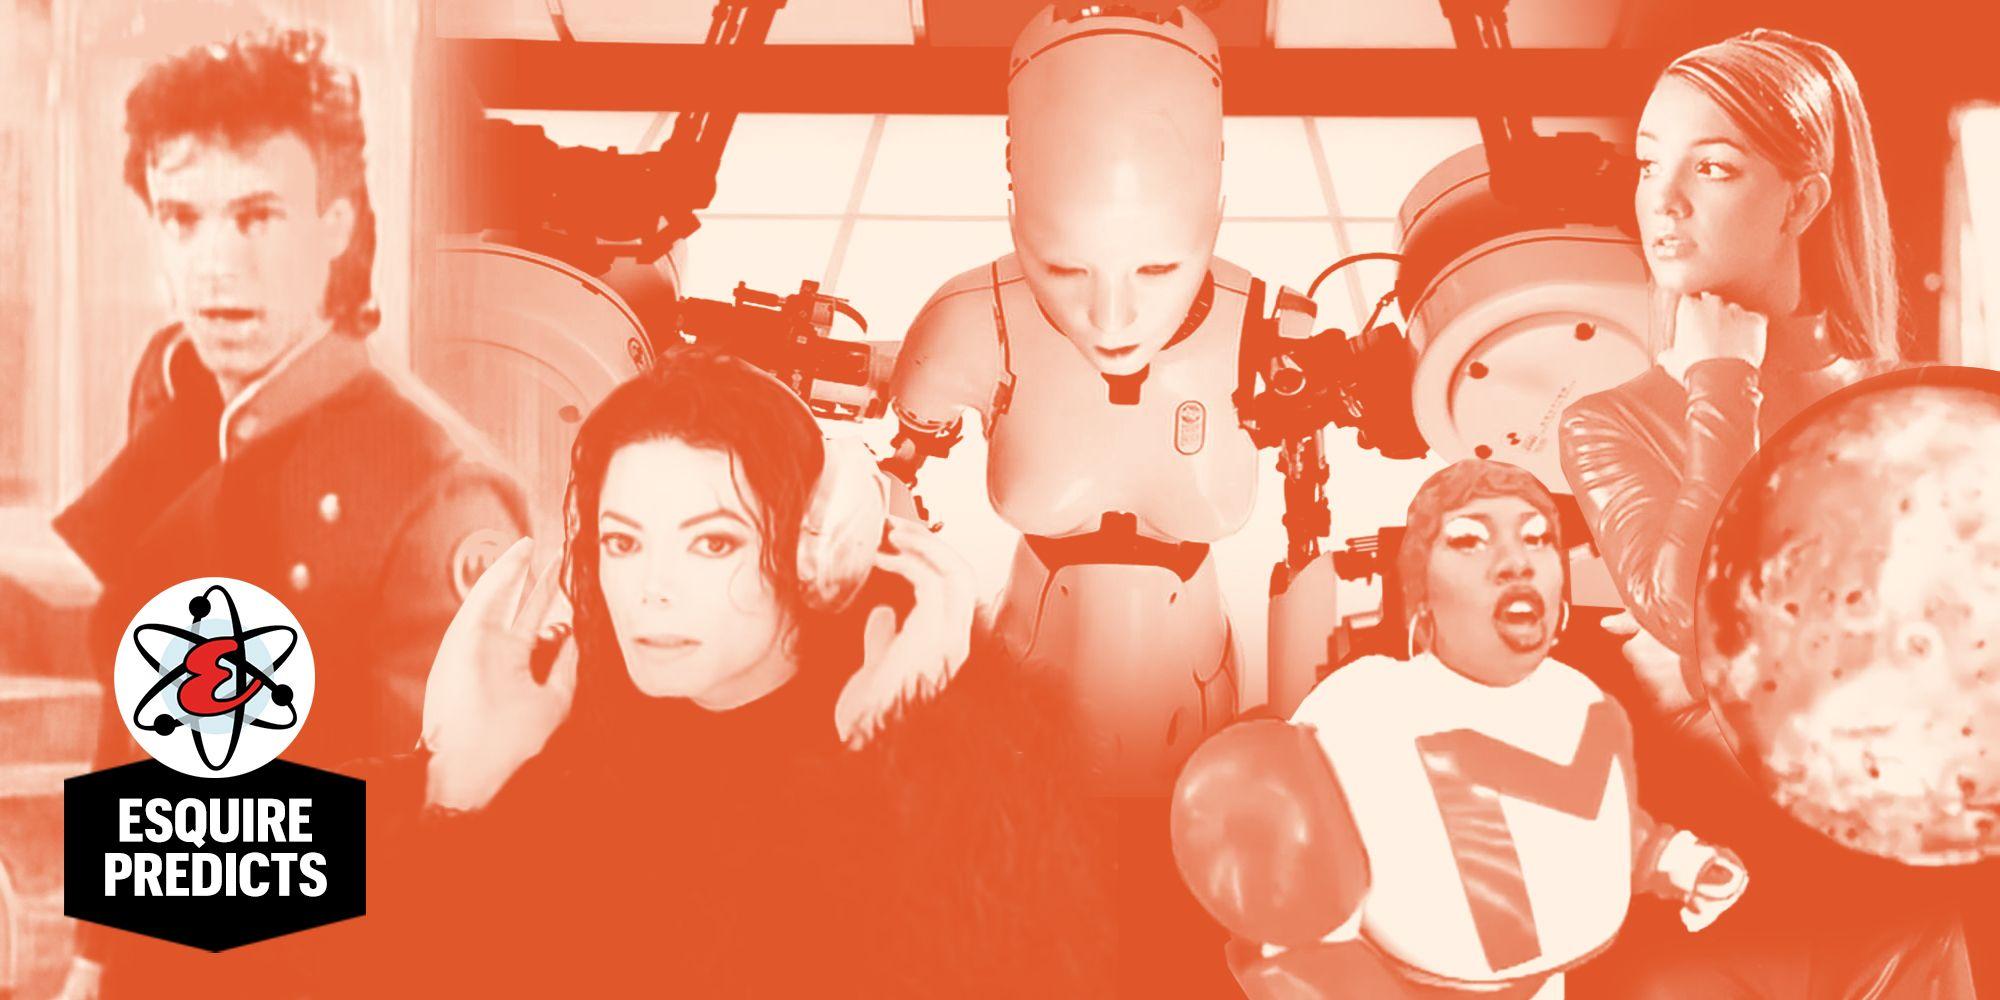 18 Futuristic Music Videos - Music Videos That Predict the